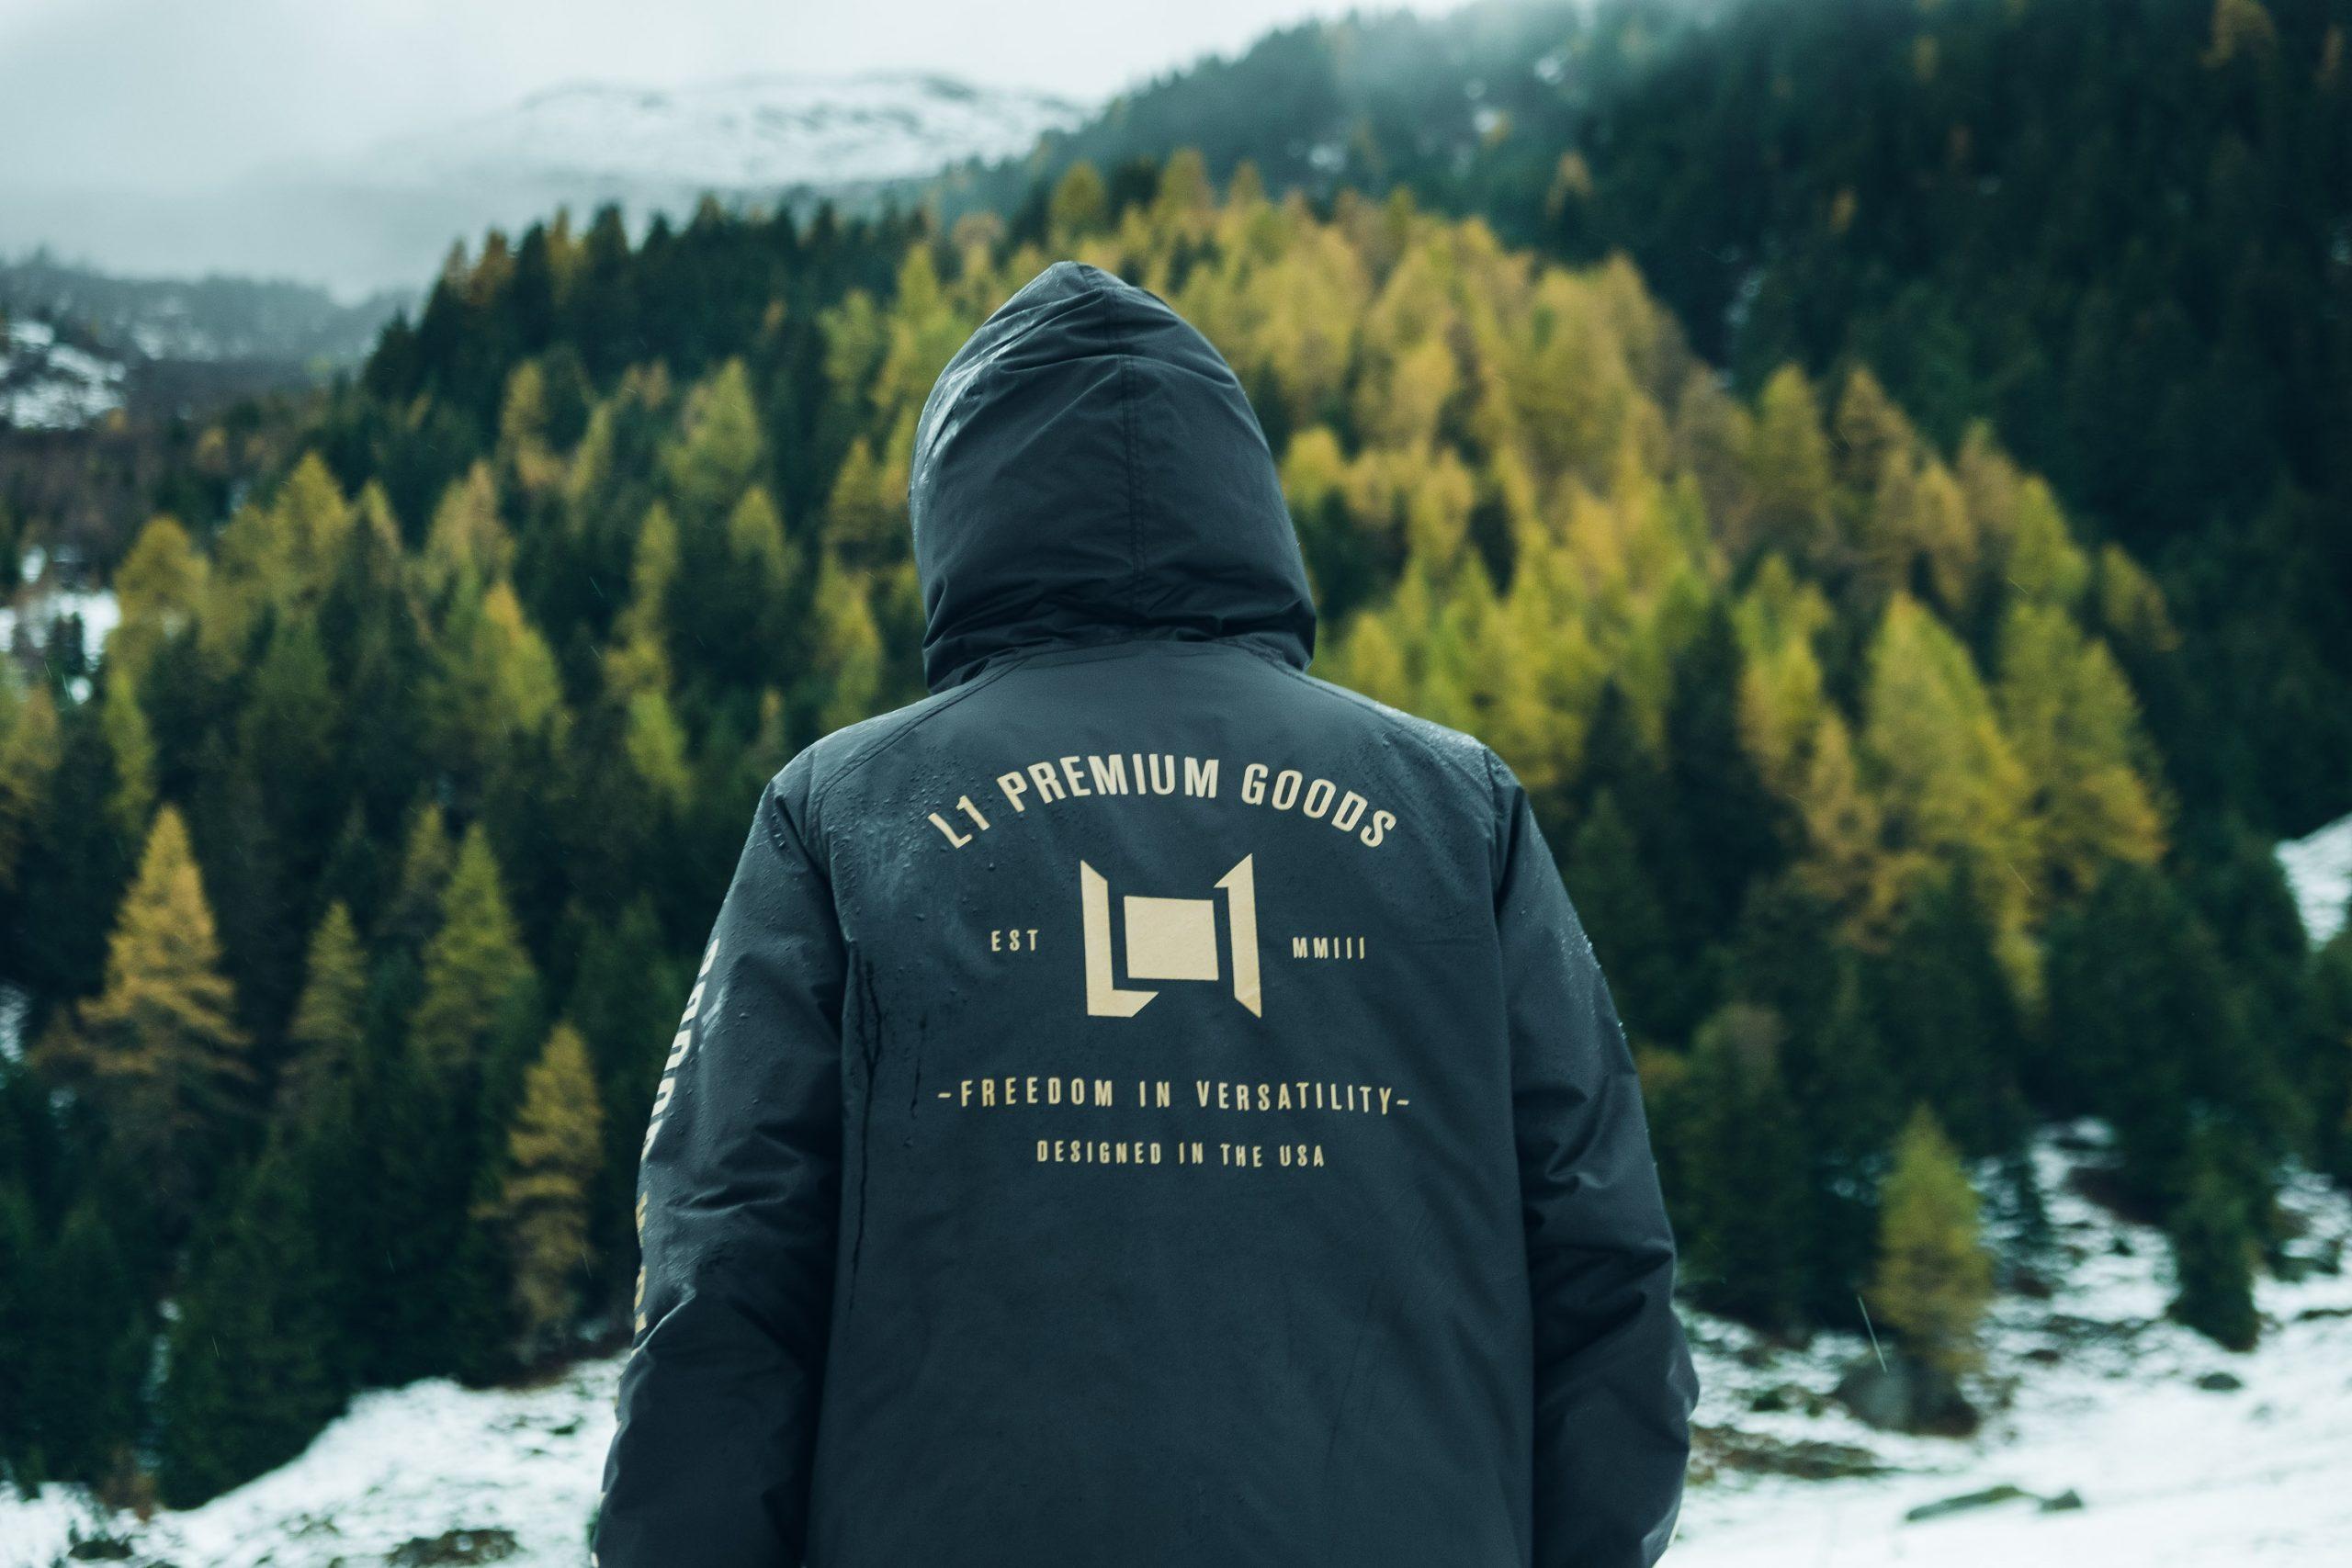 L1 Premium Goods New Winter Collection 2019 2020 20K Standard Snowboarding